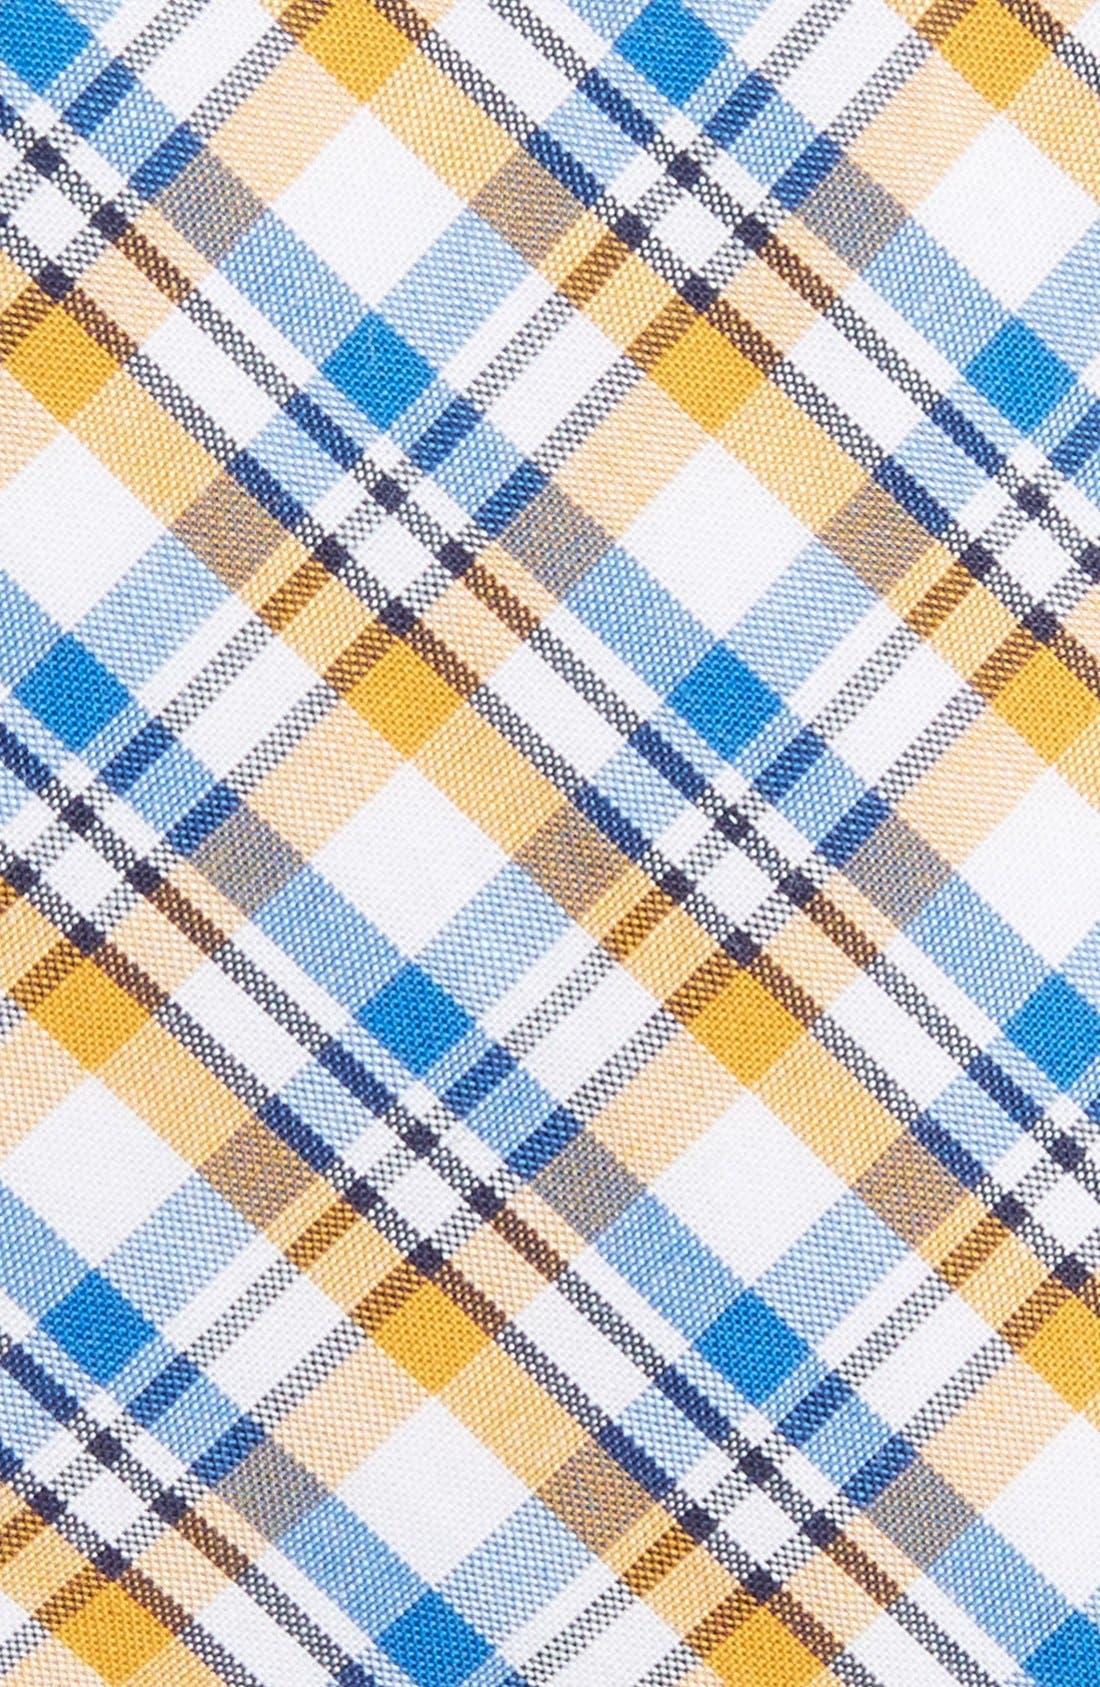 'Boomer' Plaid Cotton Tie,                             Alternate thumbnail 2, color,                             Yellow